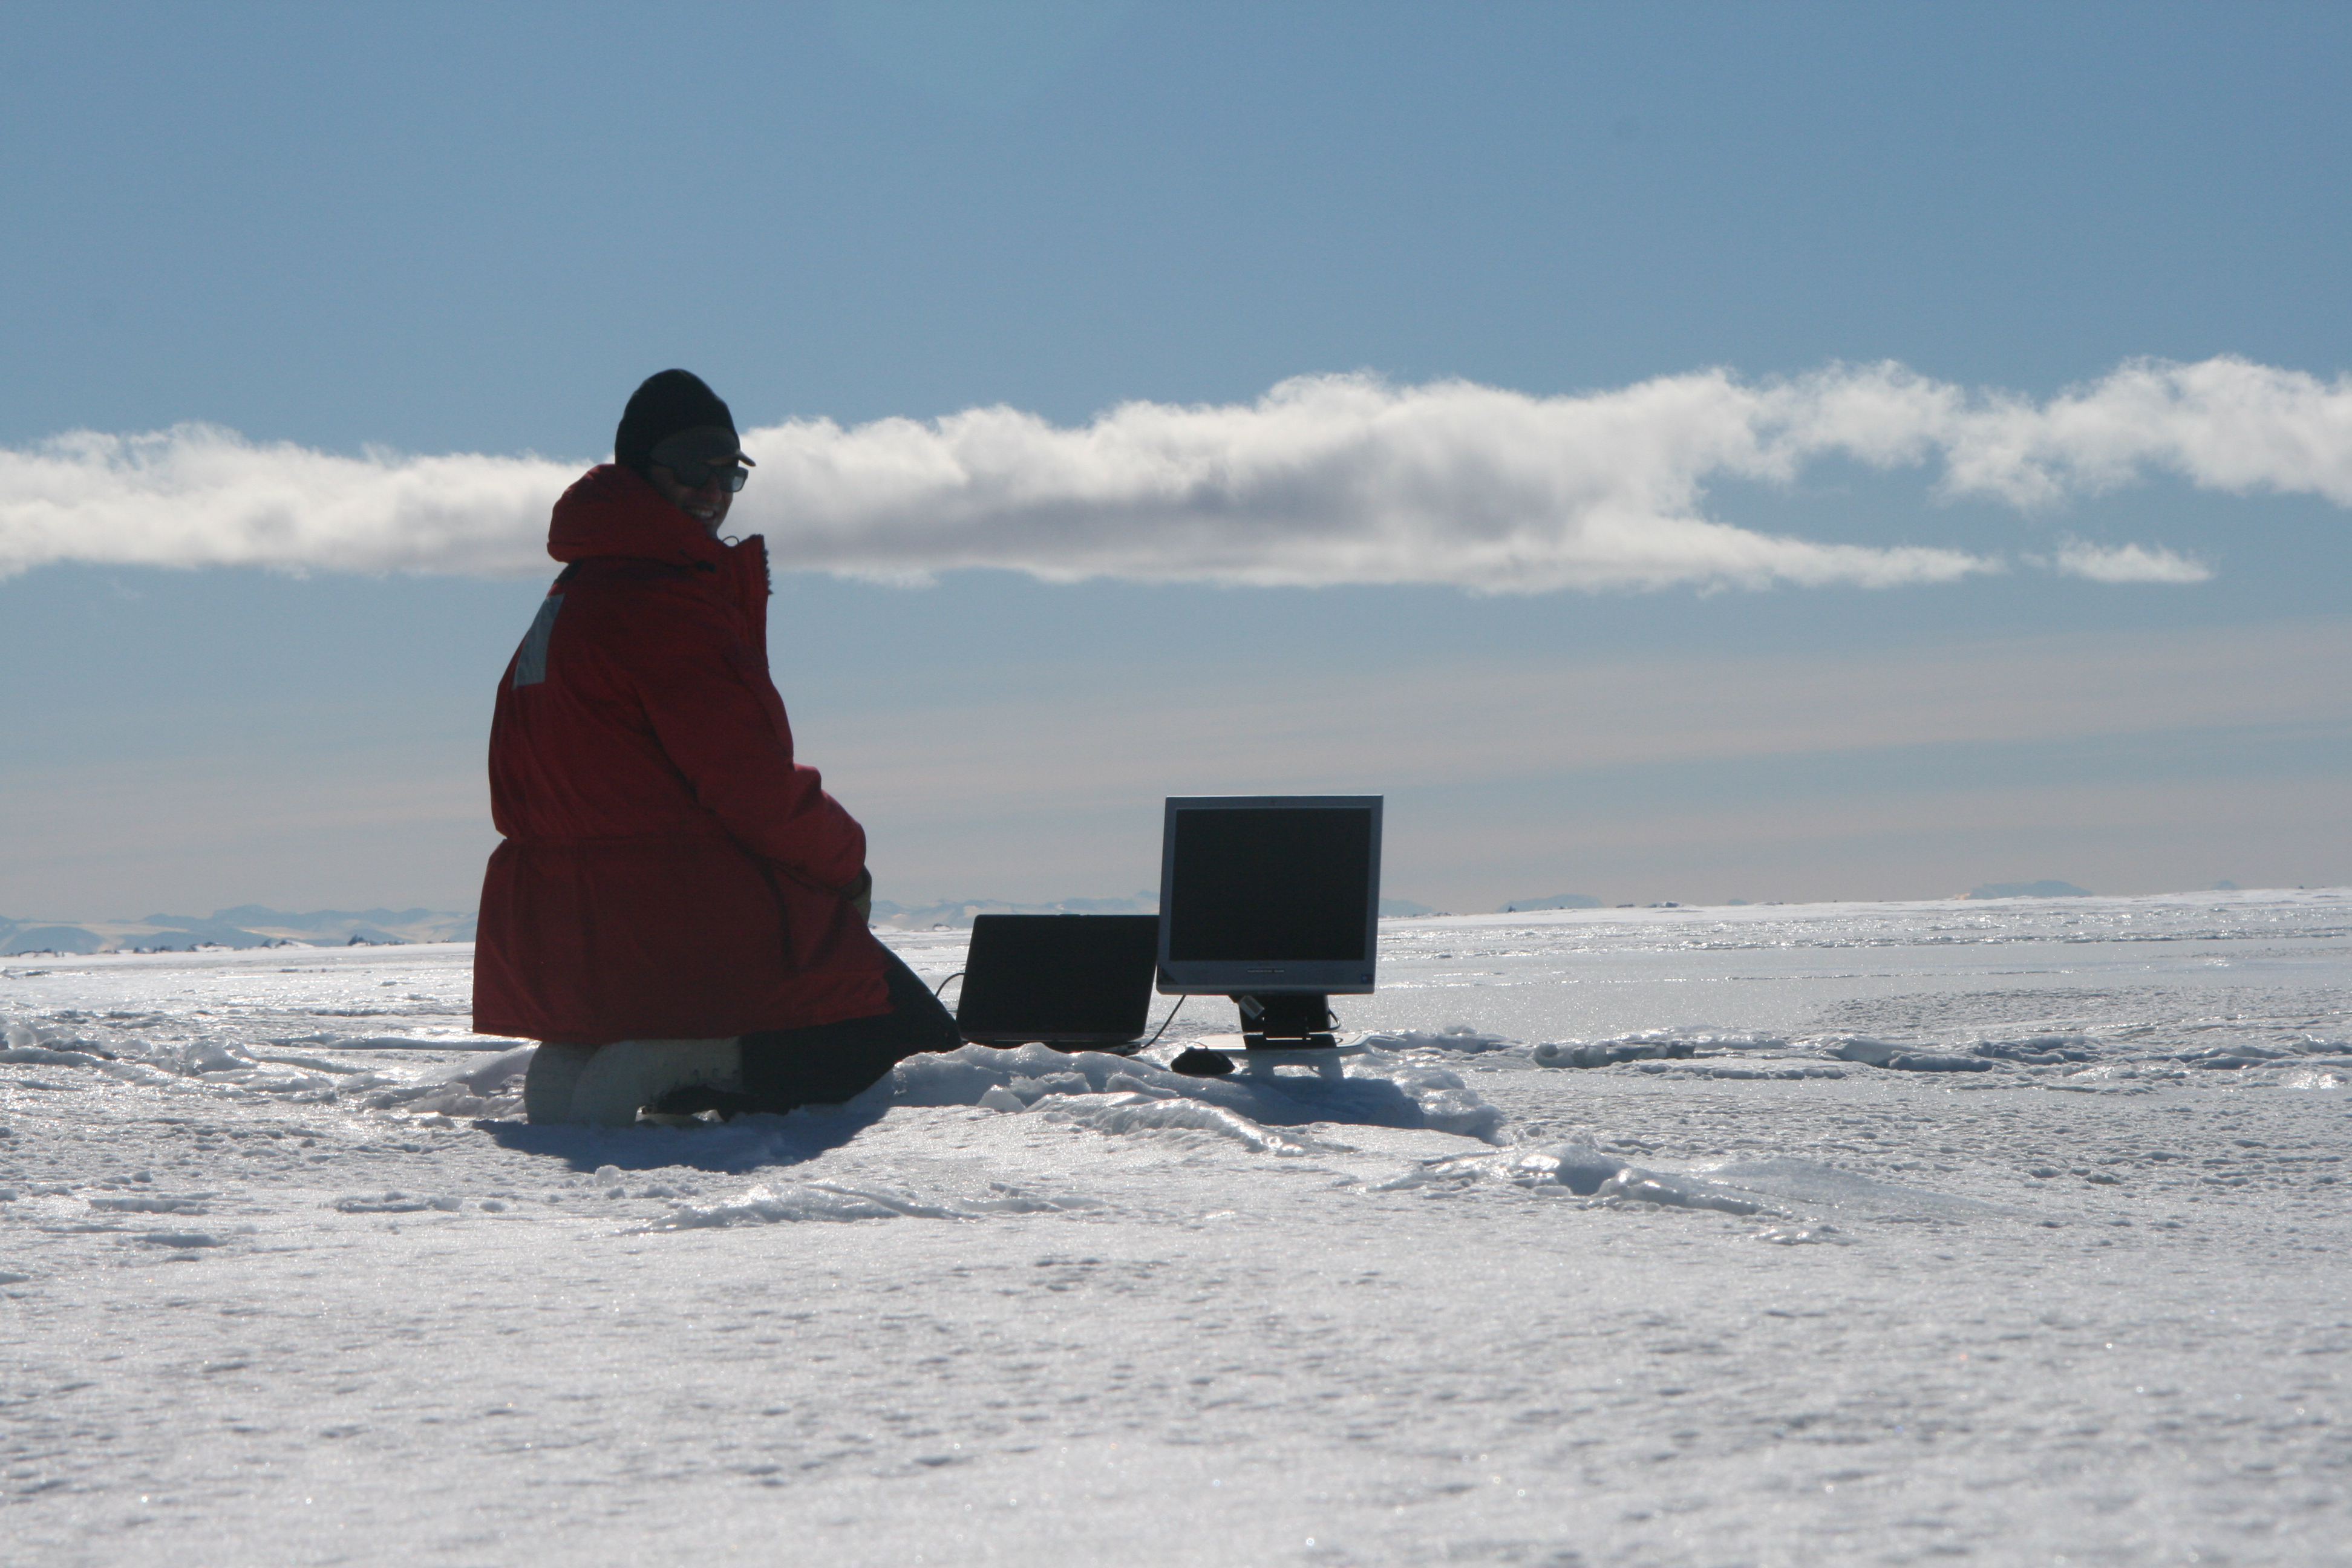 Inaccurate simulation of antarctic field work